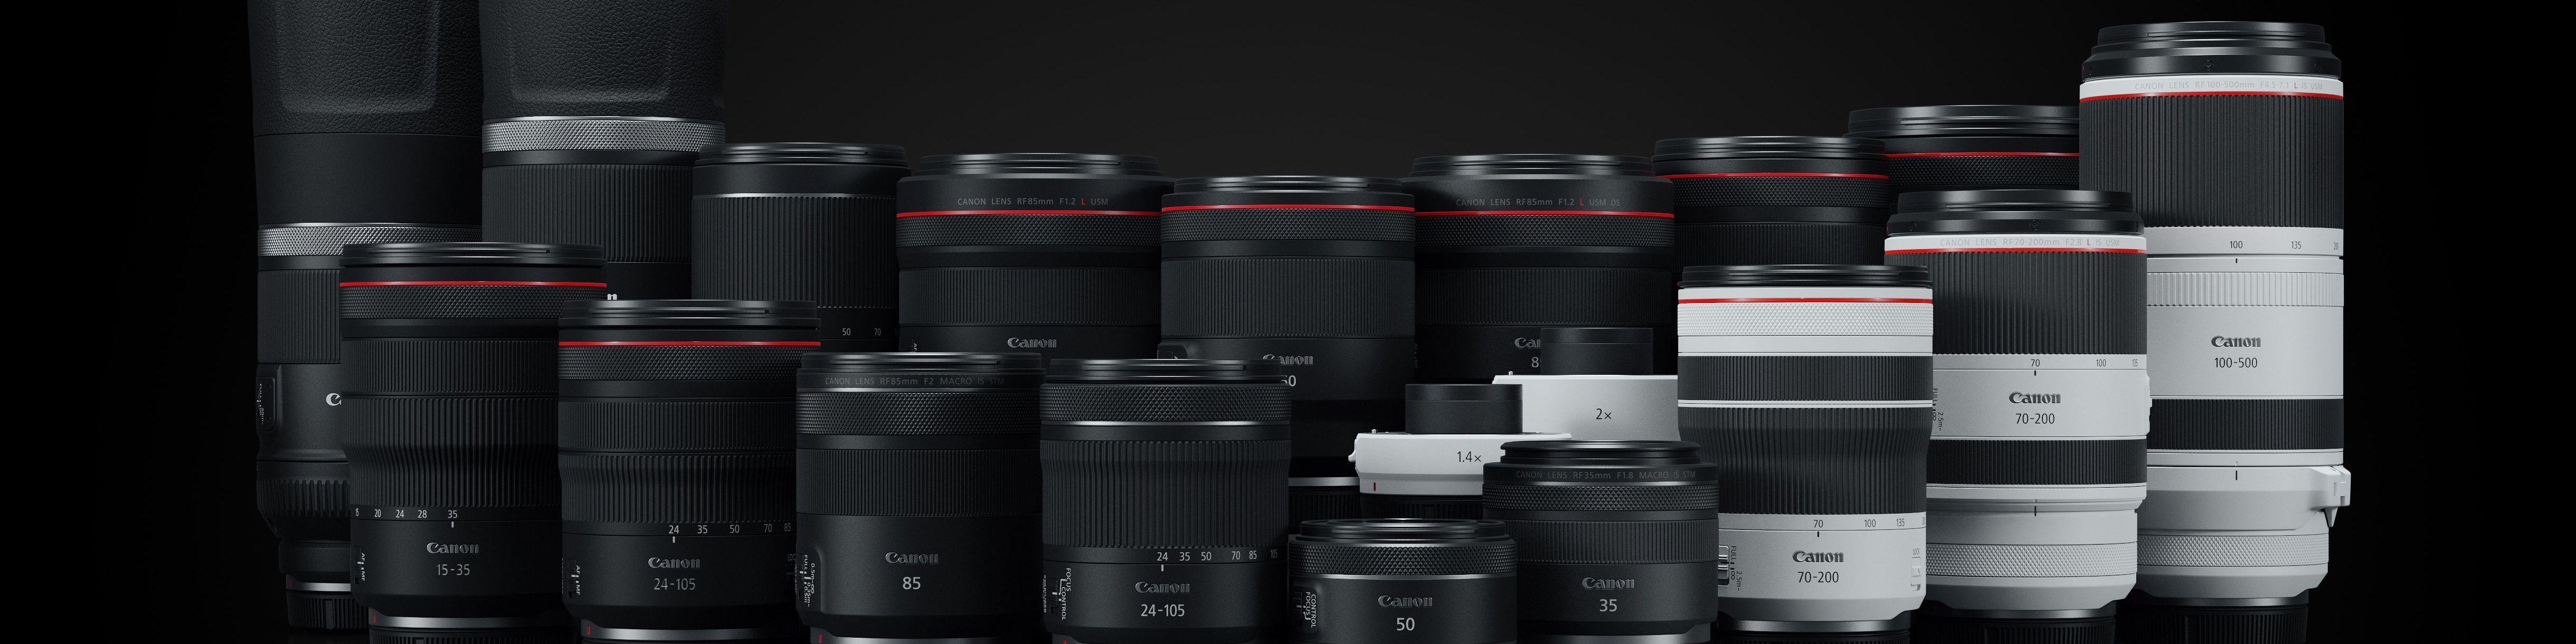 RF Lenses   Canon Compatible Lenses for EOS R   Lenses   Camera ...